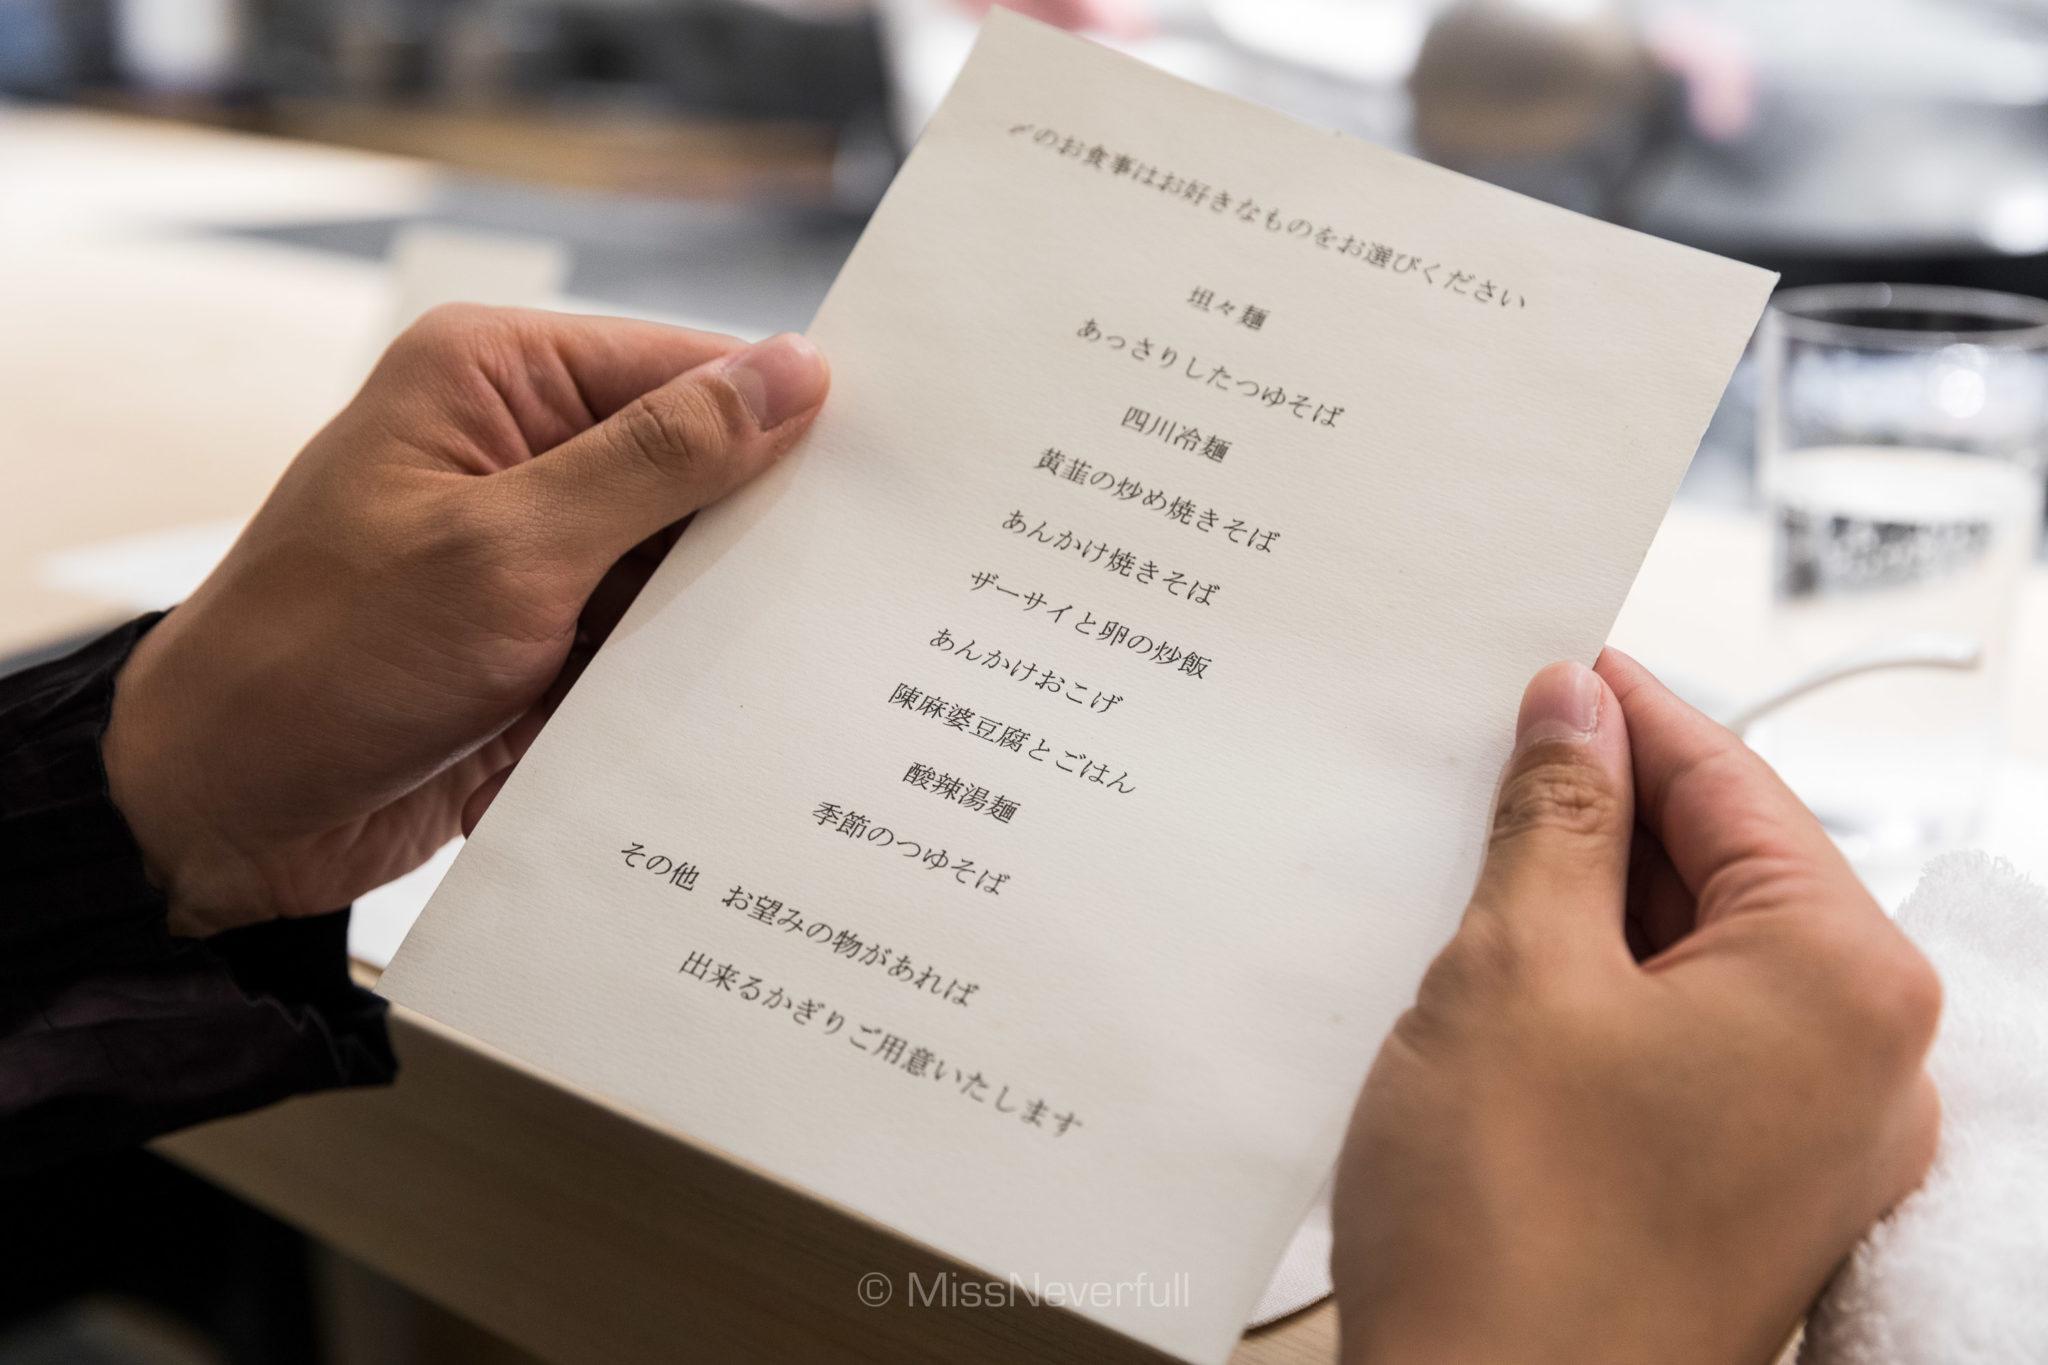 Rice dishes menu